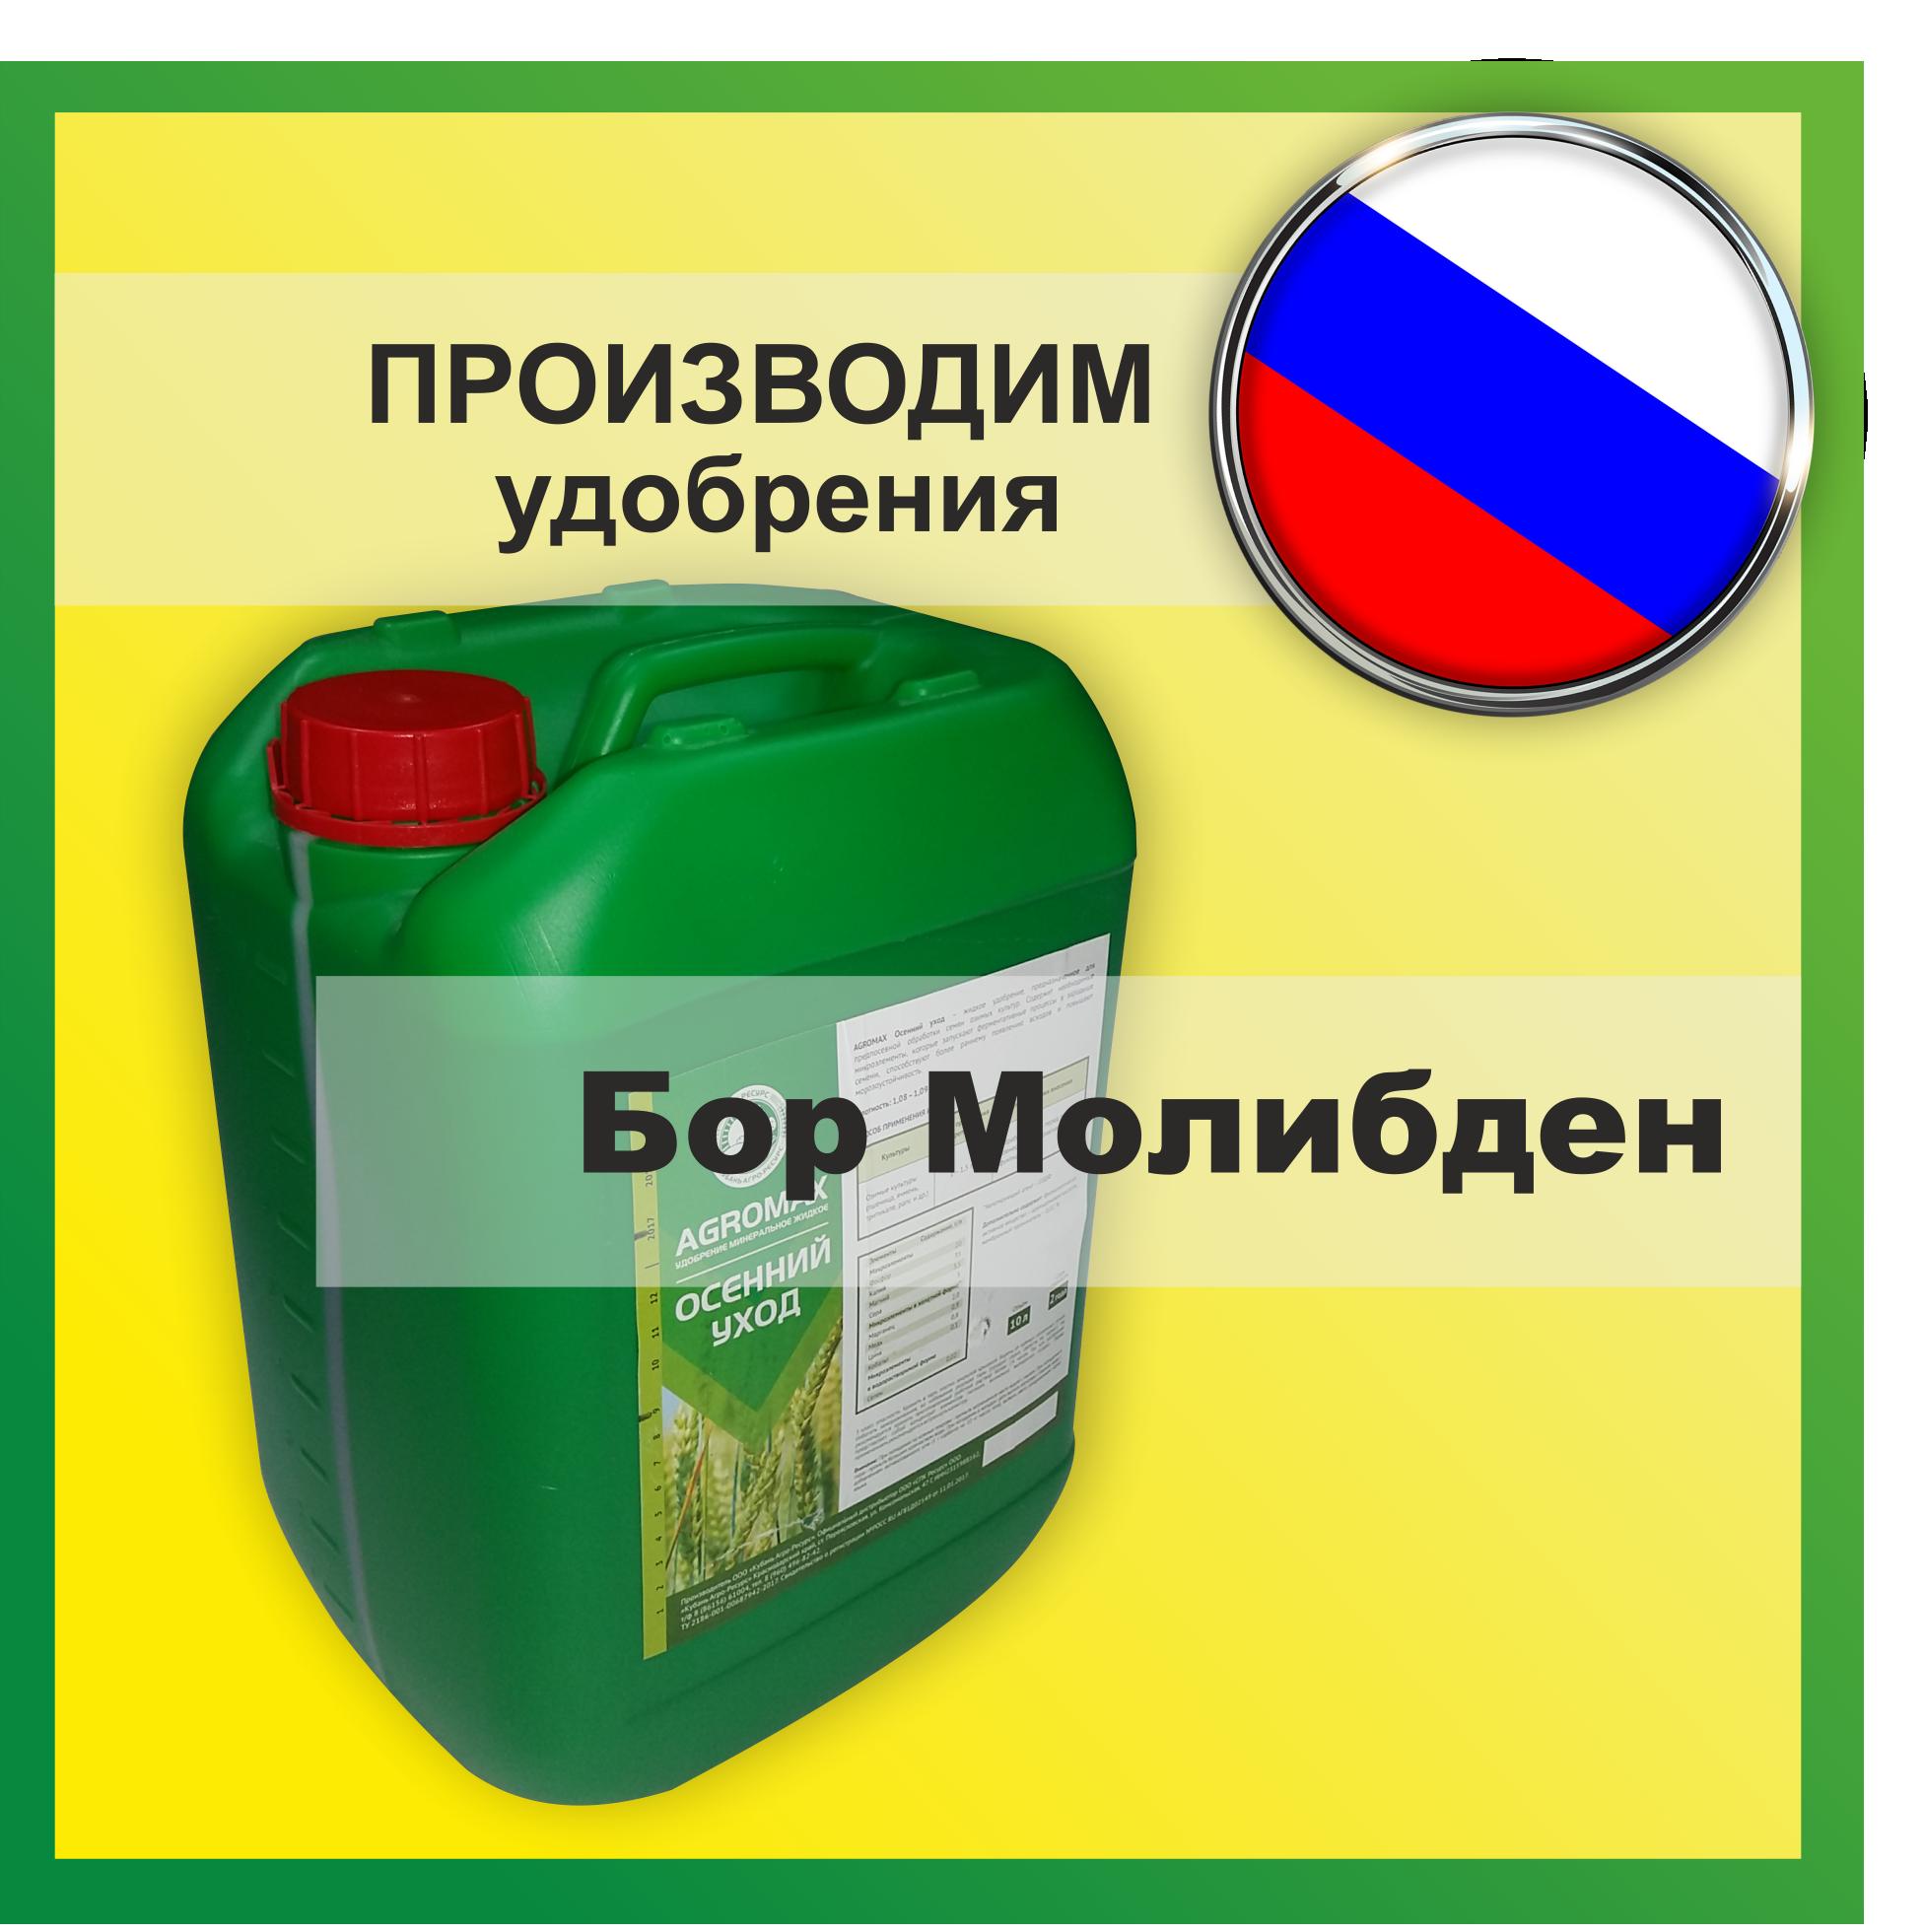 Bor-Molibden-udobrenie-agromaks-1-1